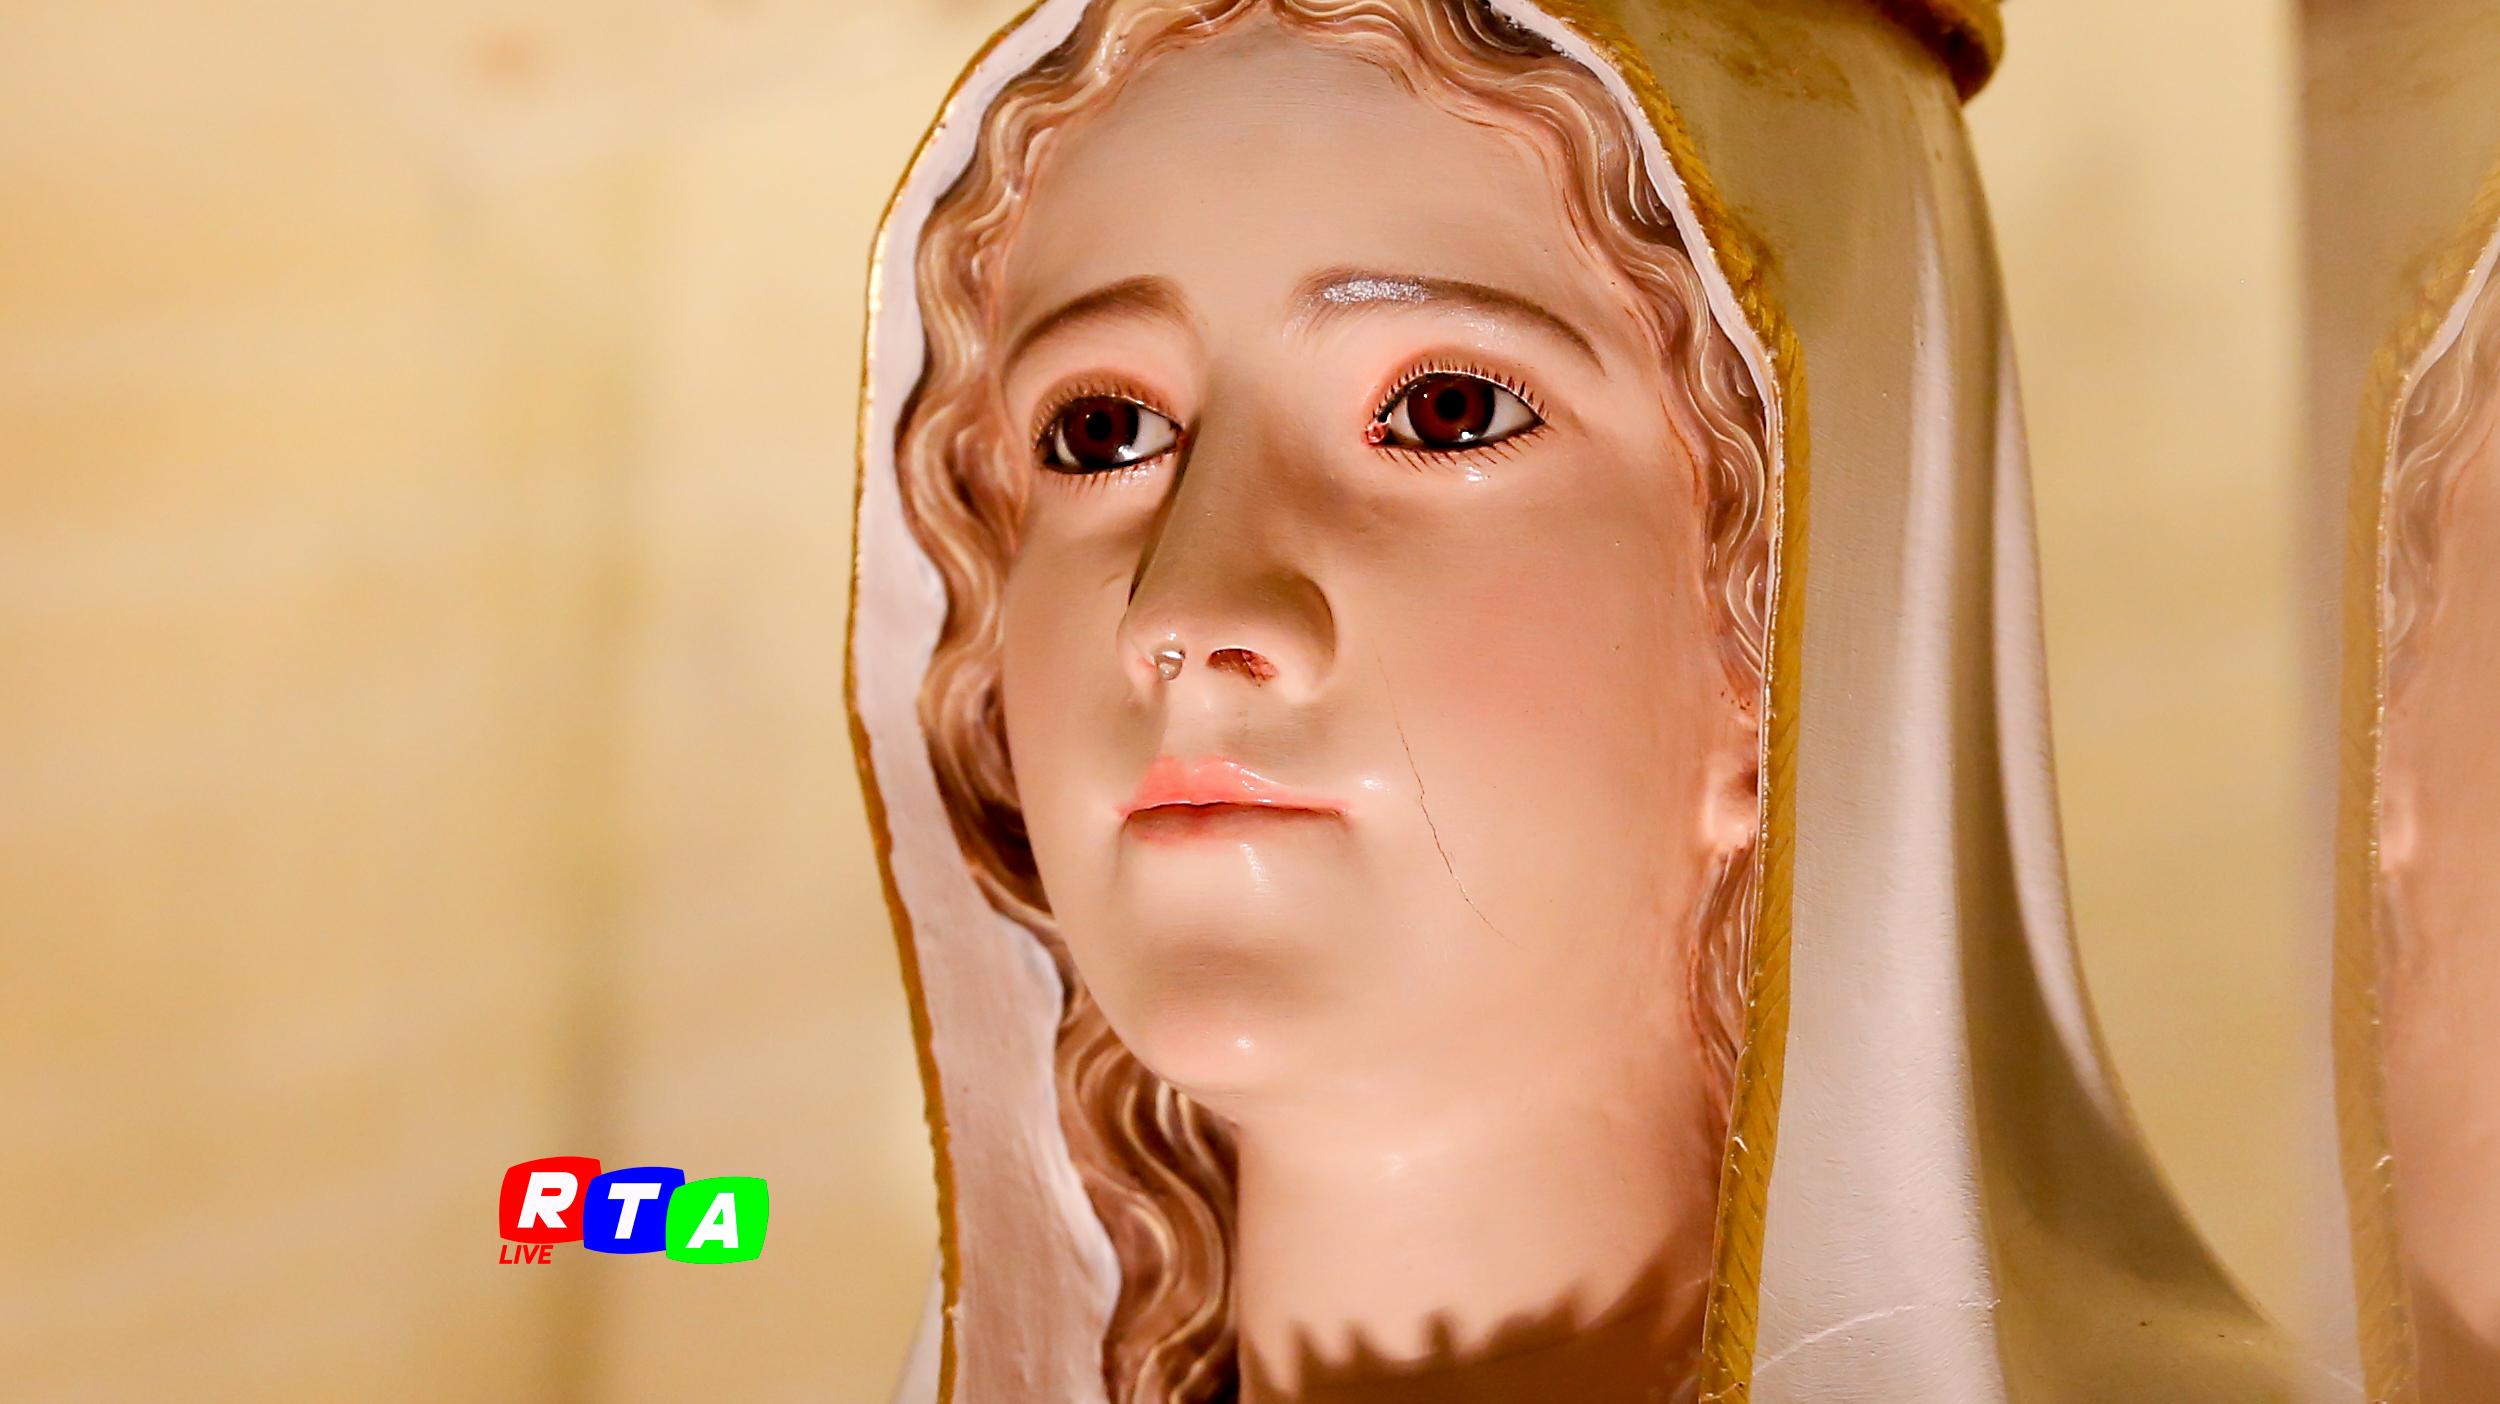 madonna montalbino piange nocera inferiore